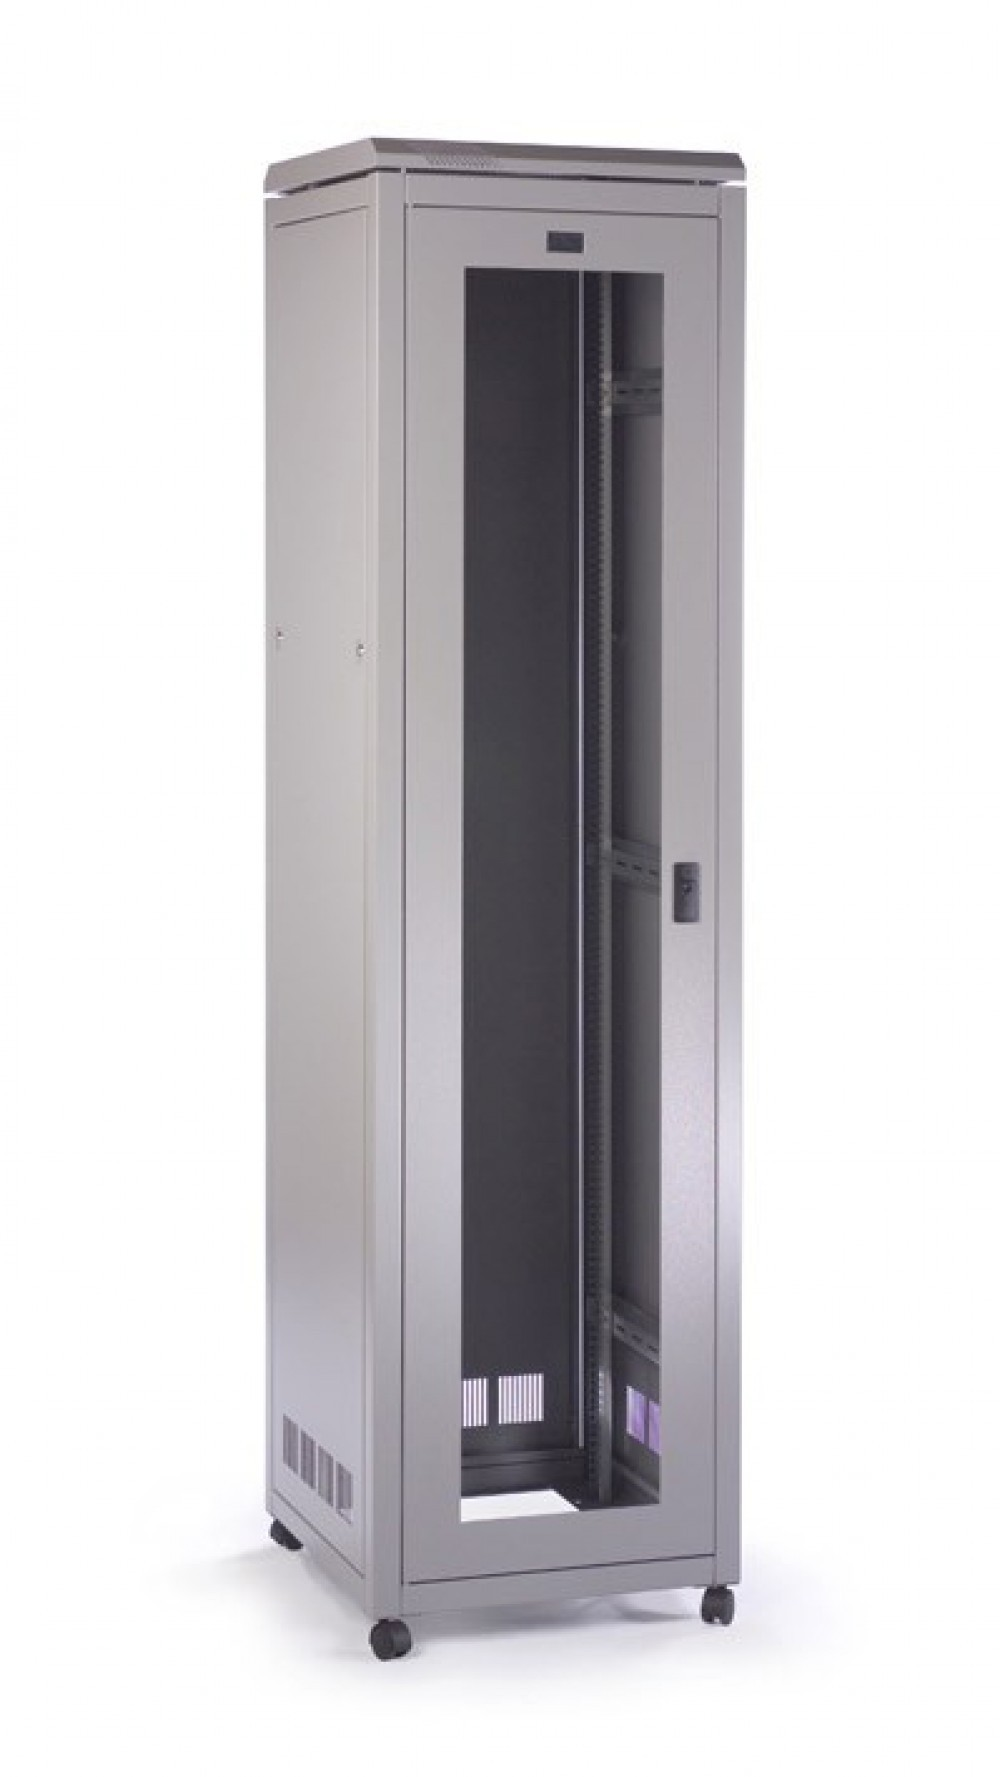 Prism Free Standing Cabinet 45U (2205x600x800)